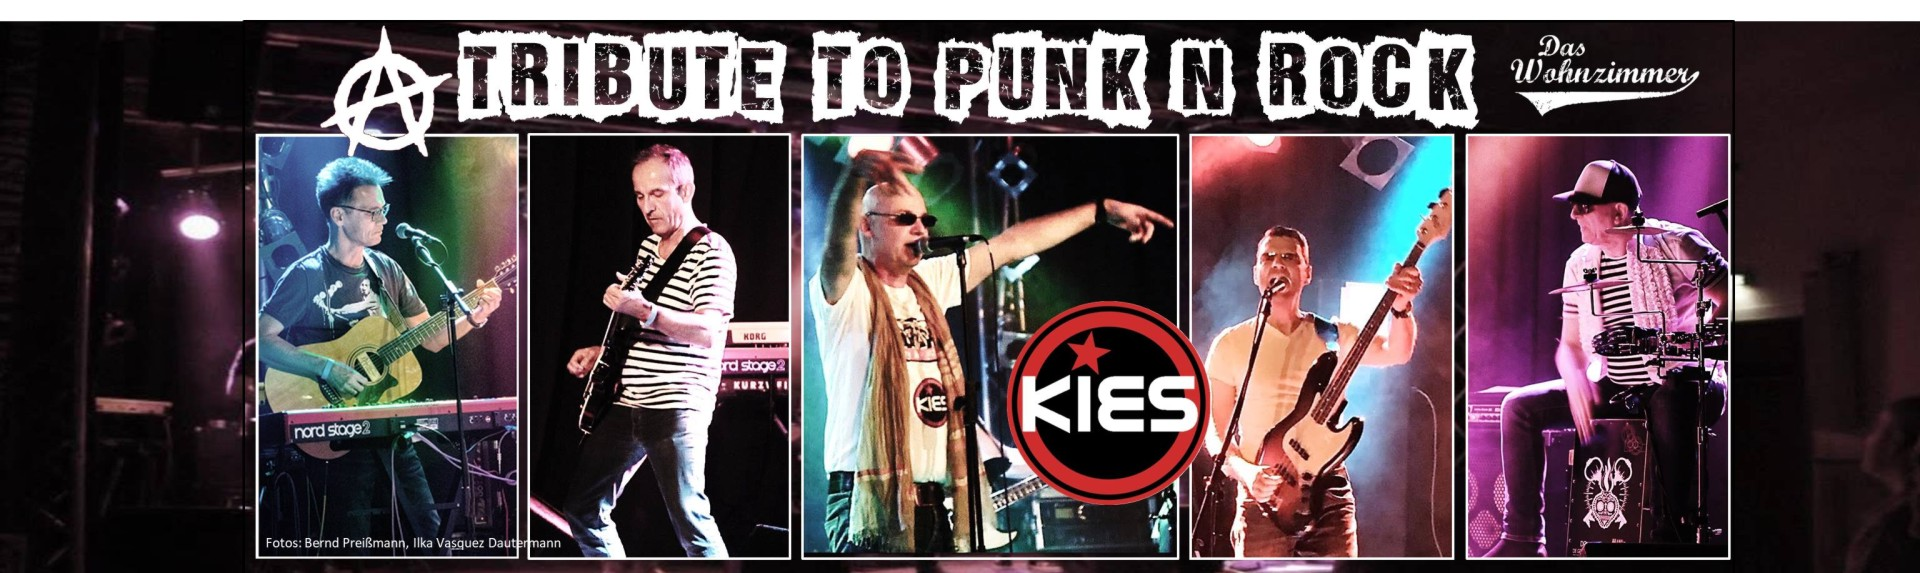 "04.04.2019 - kies im ""wohnzimmer"" a tribute to punk n rock"